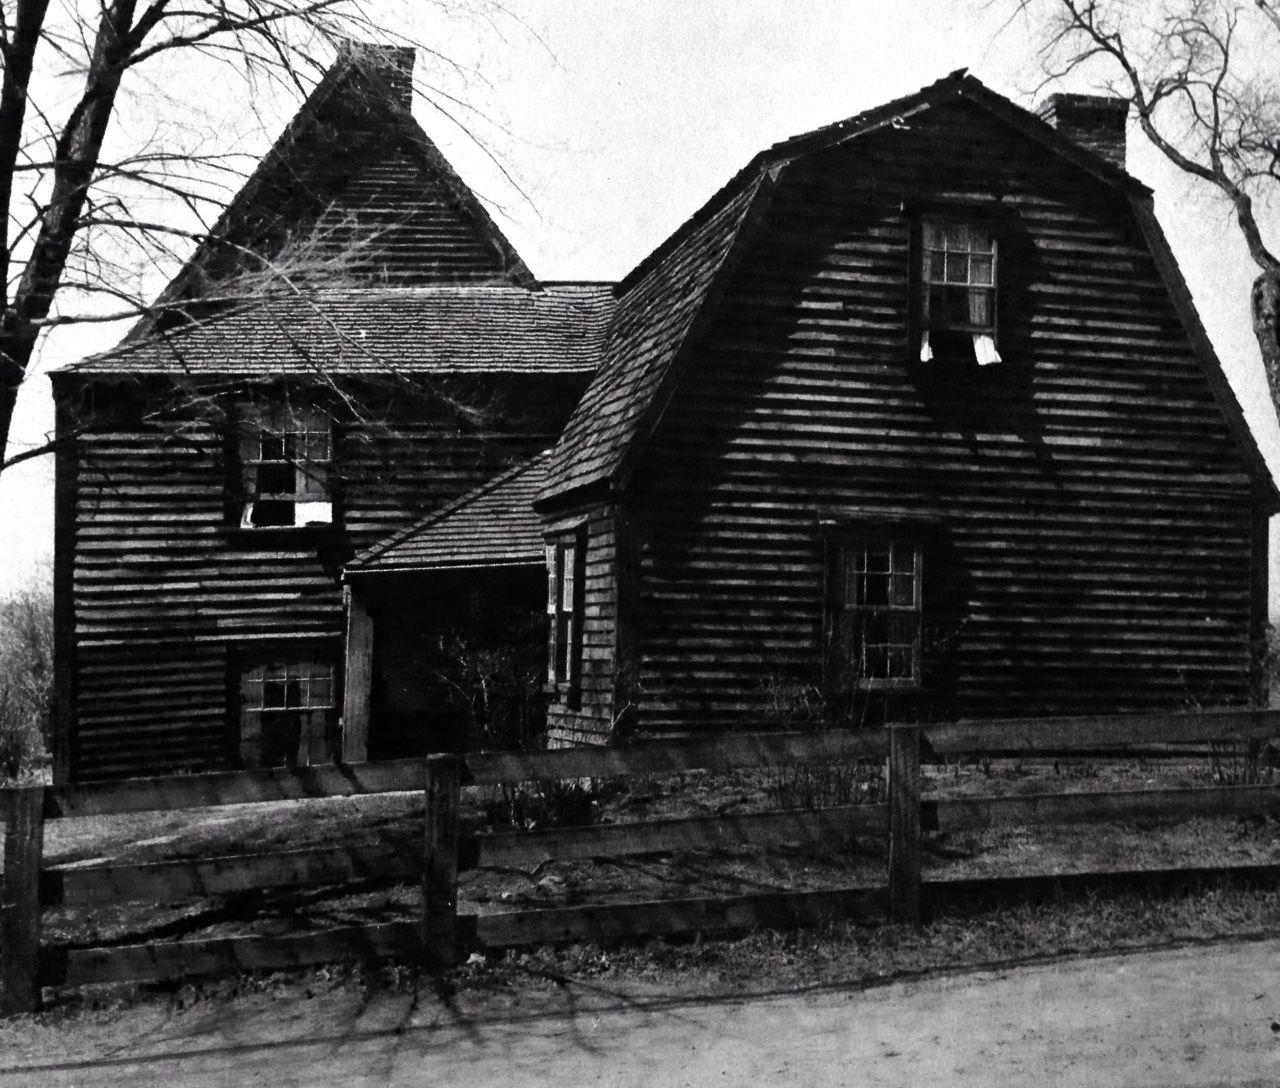 The Fairbanks House…Dedham Massachusetts…mid 17 th century…perhaps the oldest wood frame house in America…